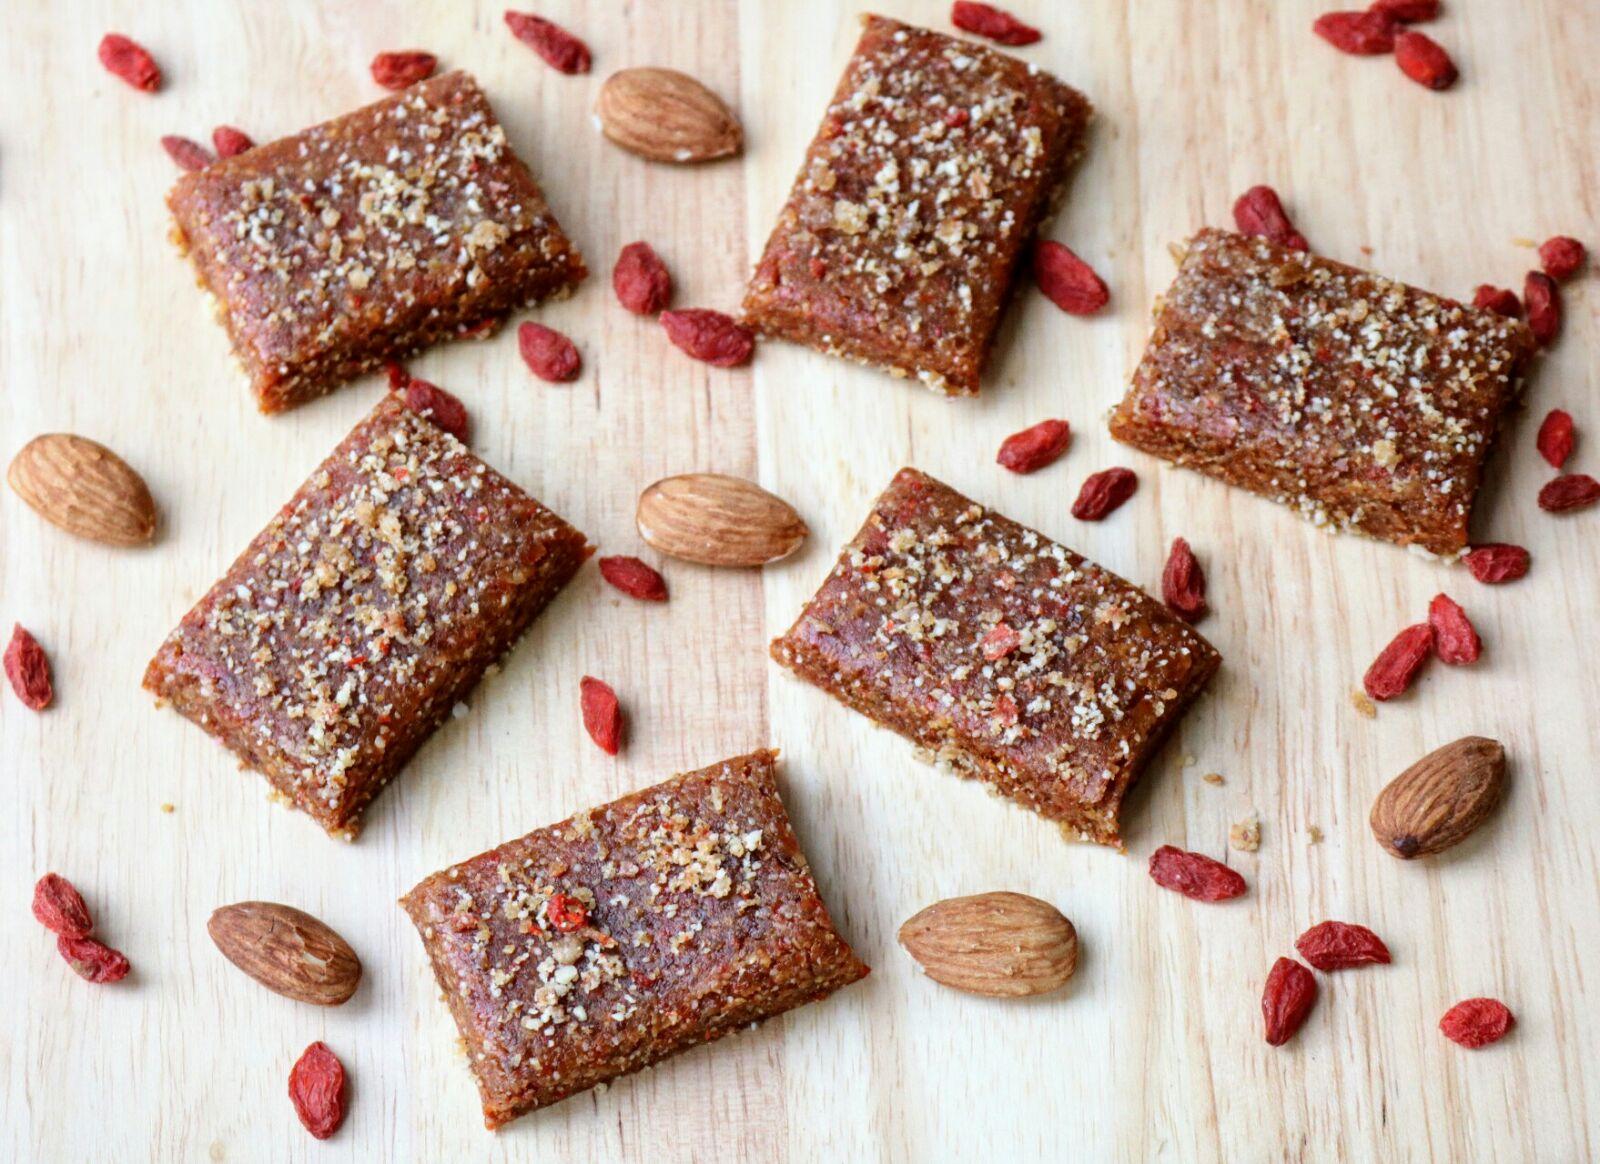 Almond & Goji Berry Protein Bites